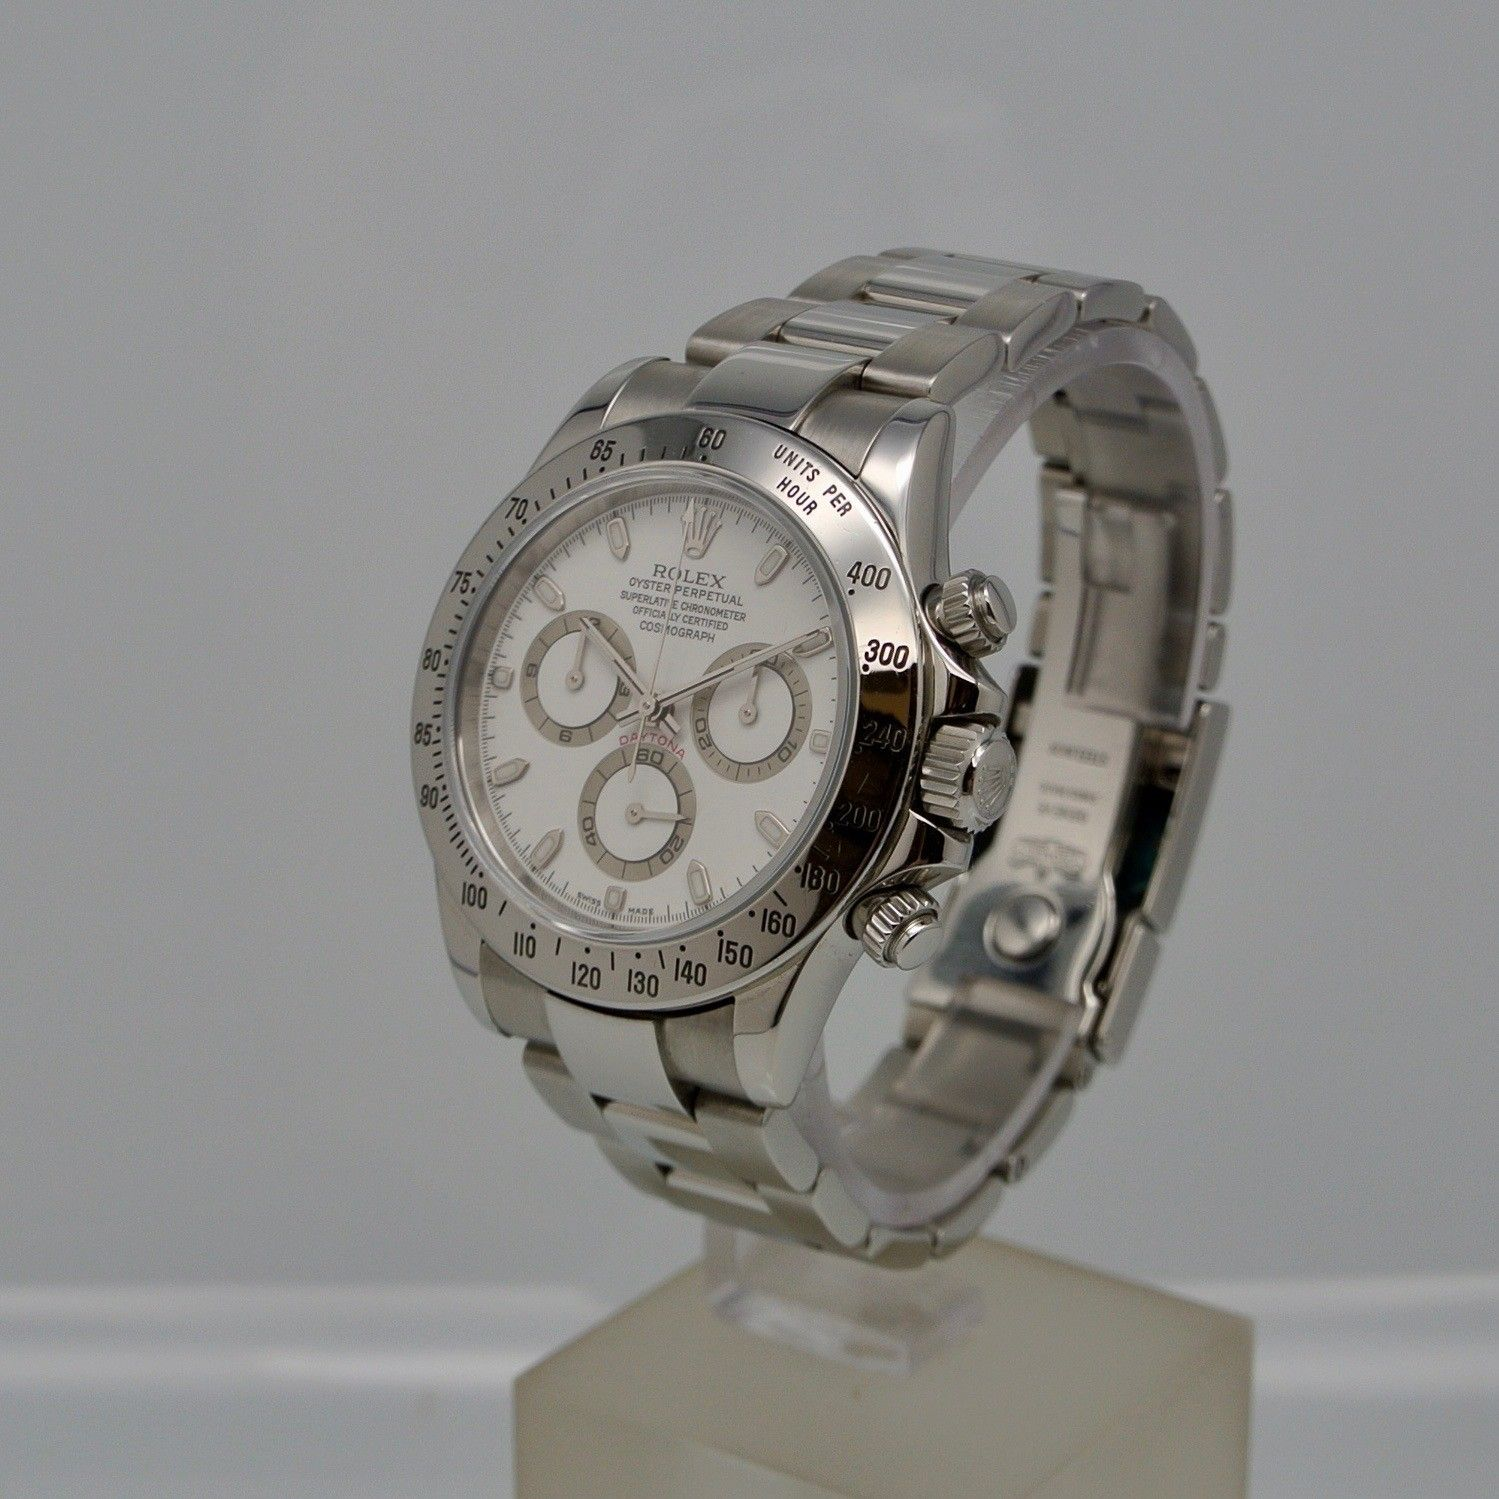 Rolex Daytona Cream Dial seriale K